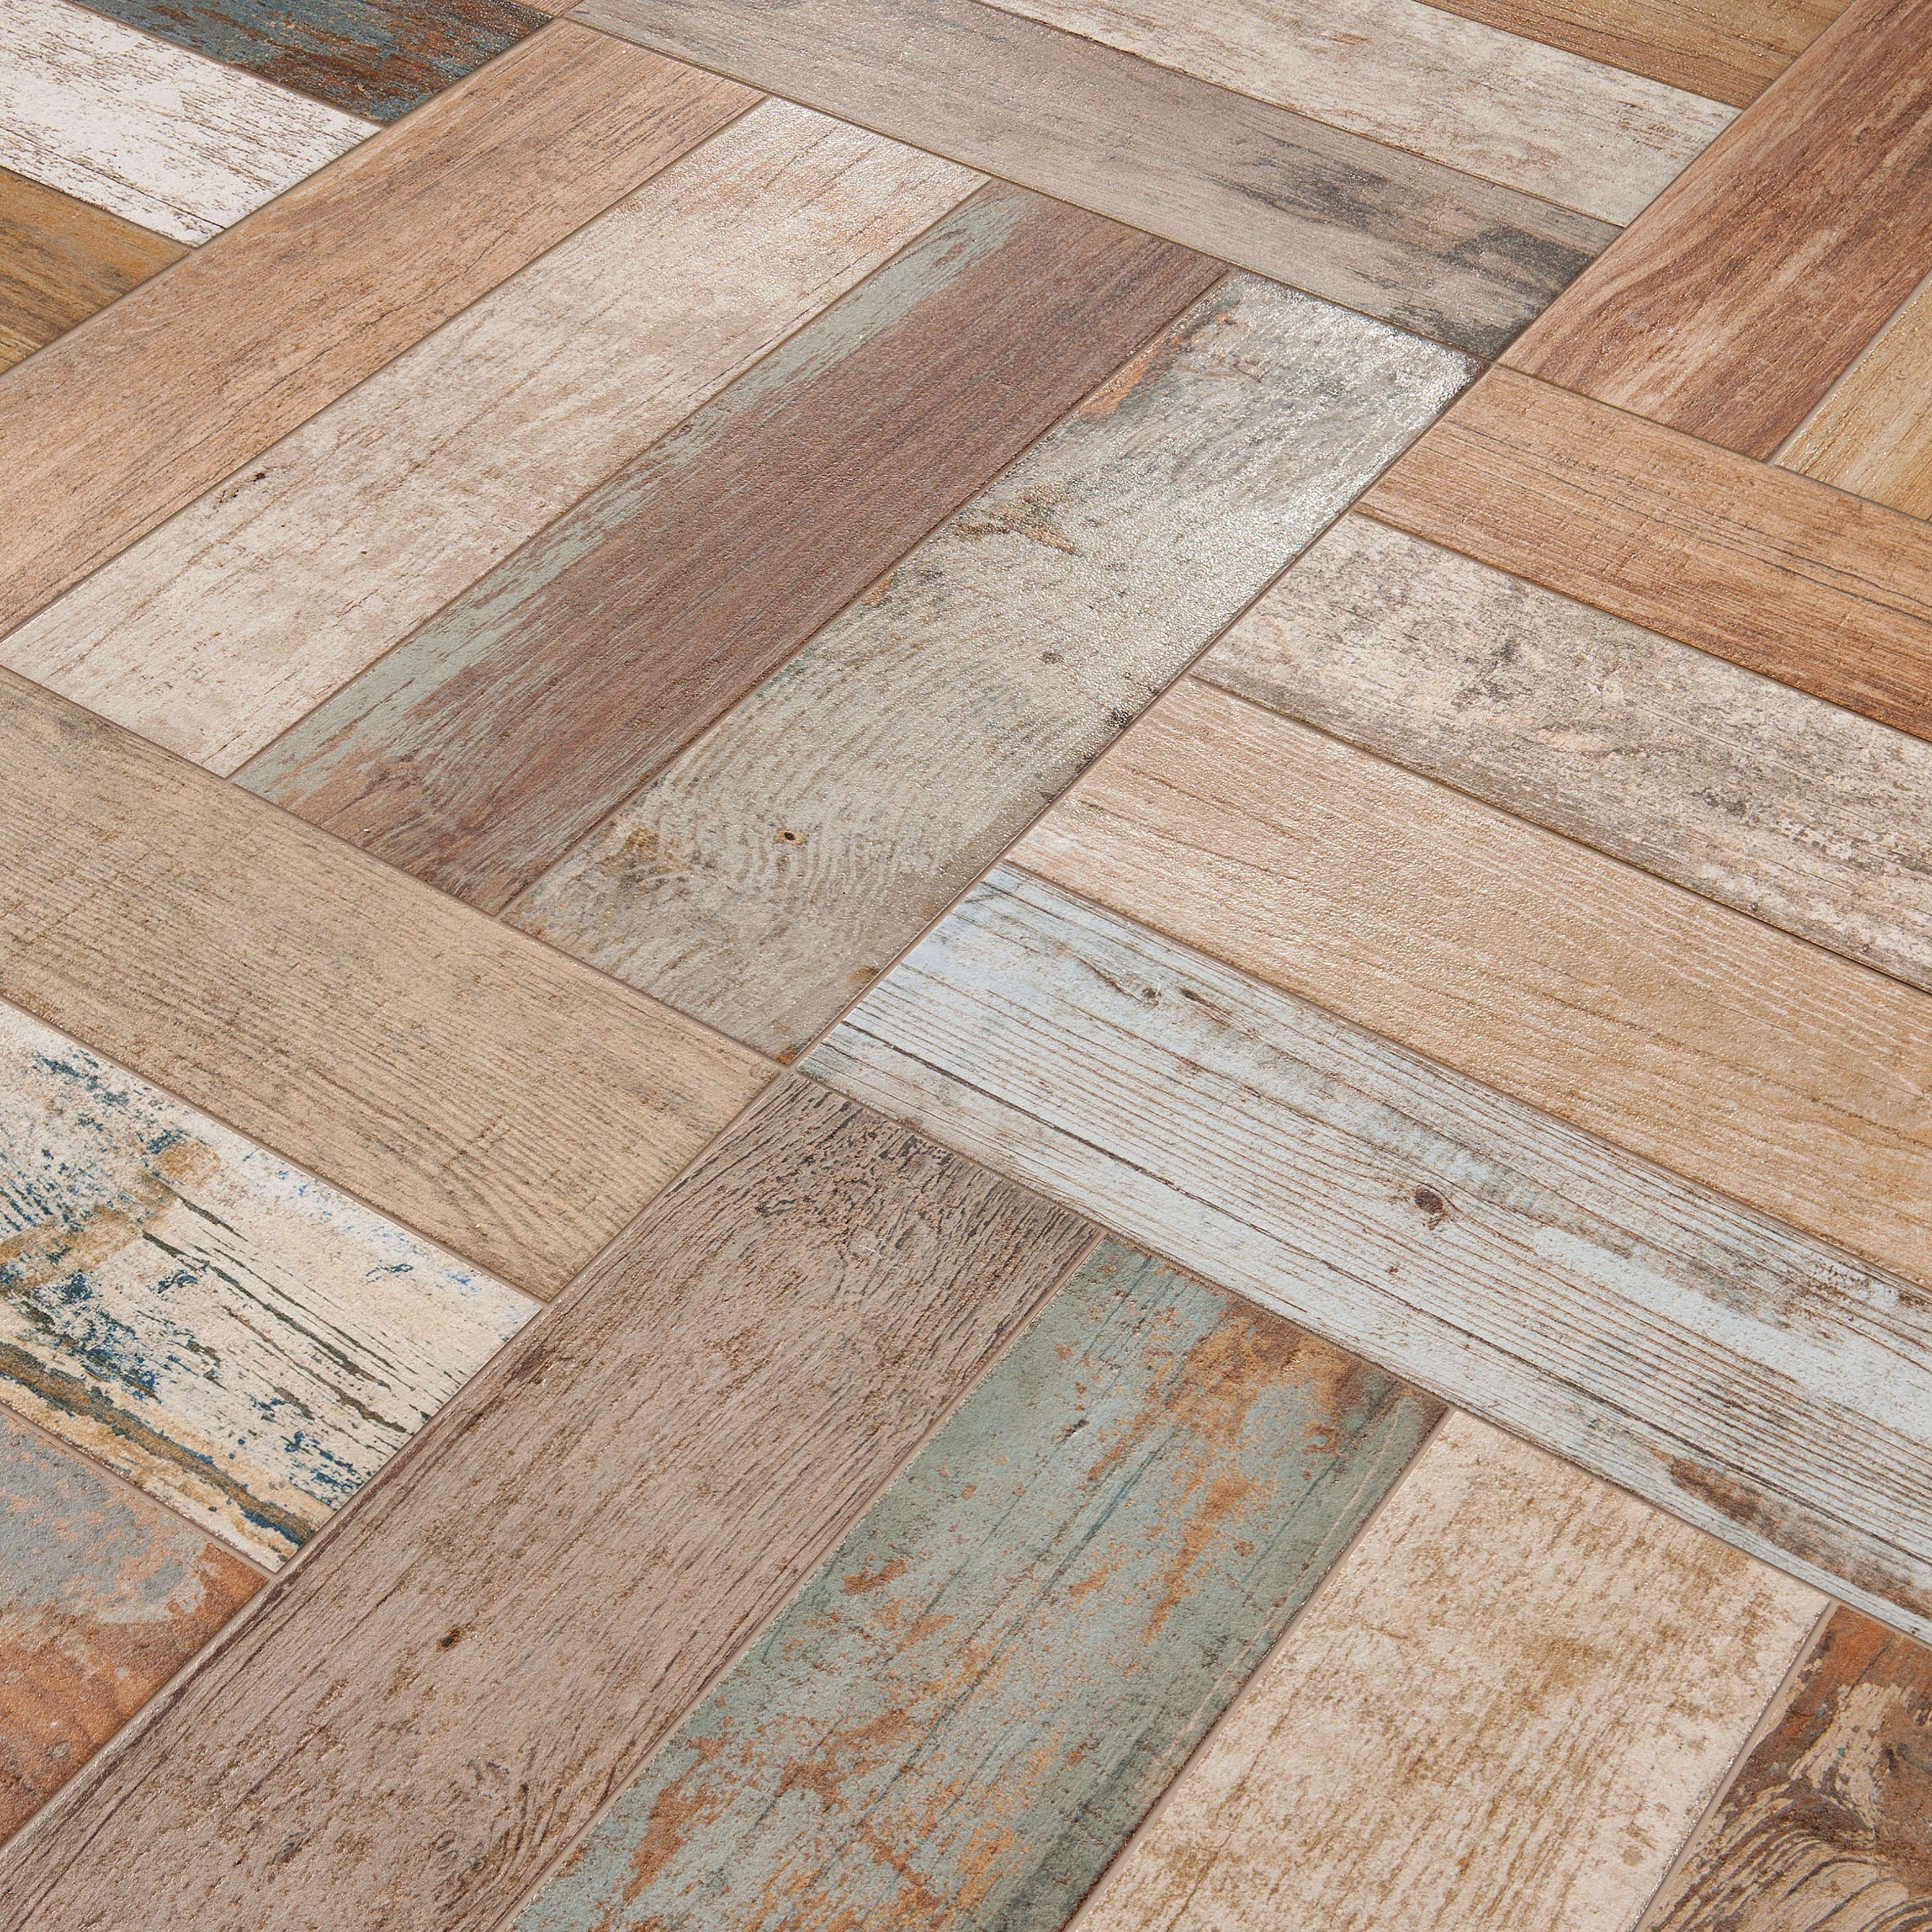 Somertile 17 75x17 75 Inch Royals Bretagne Ceramic Floor